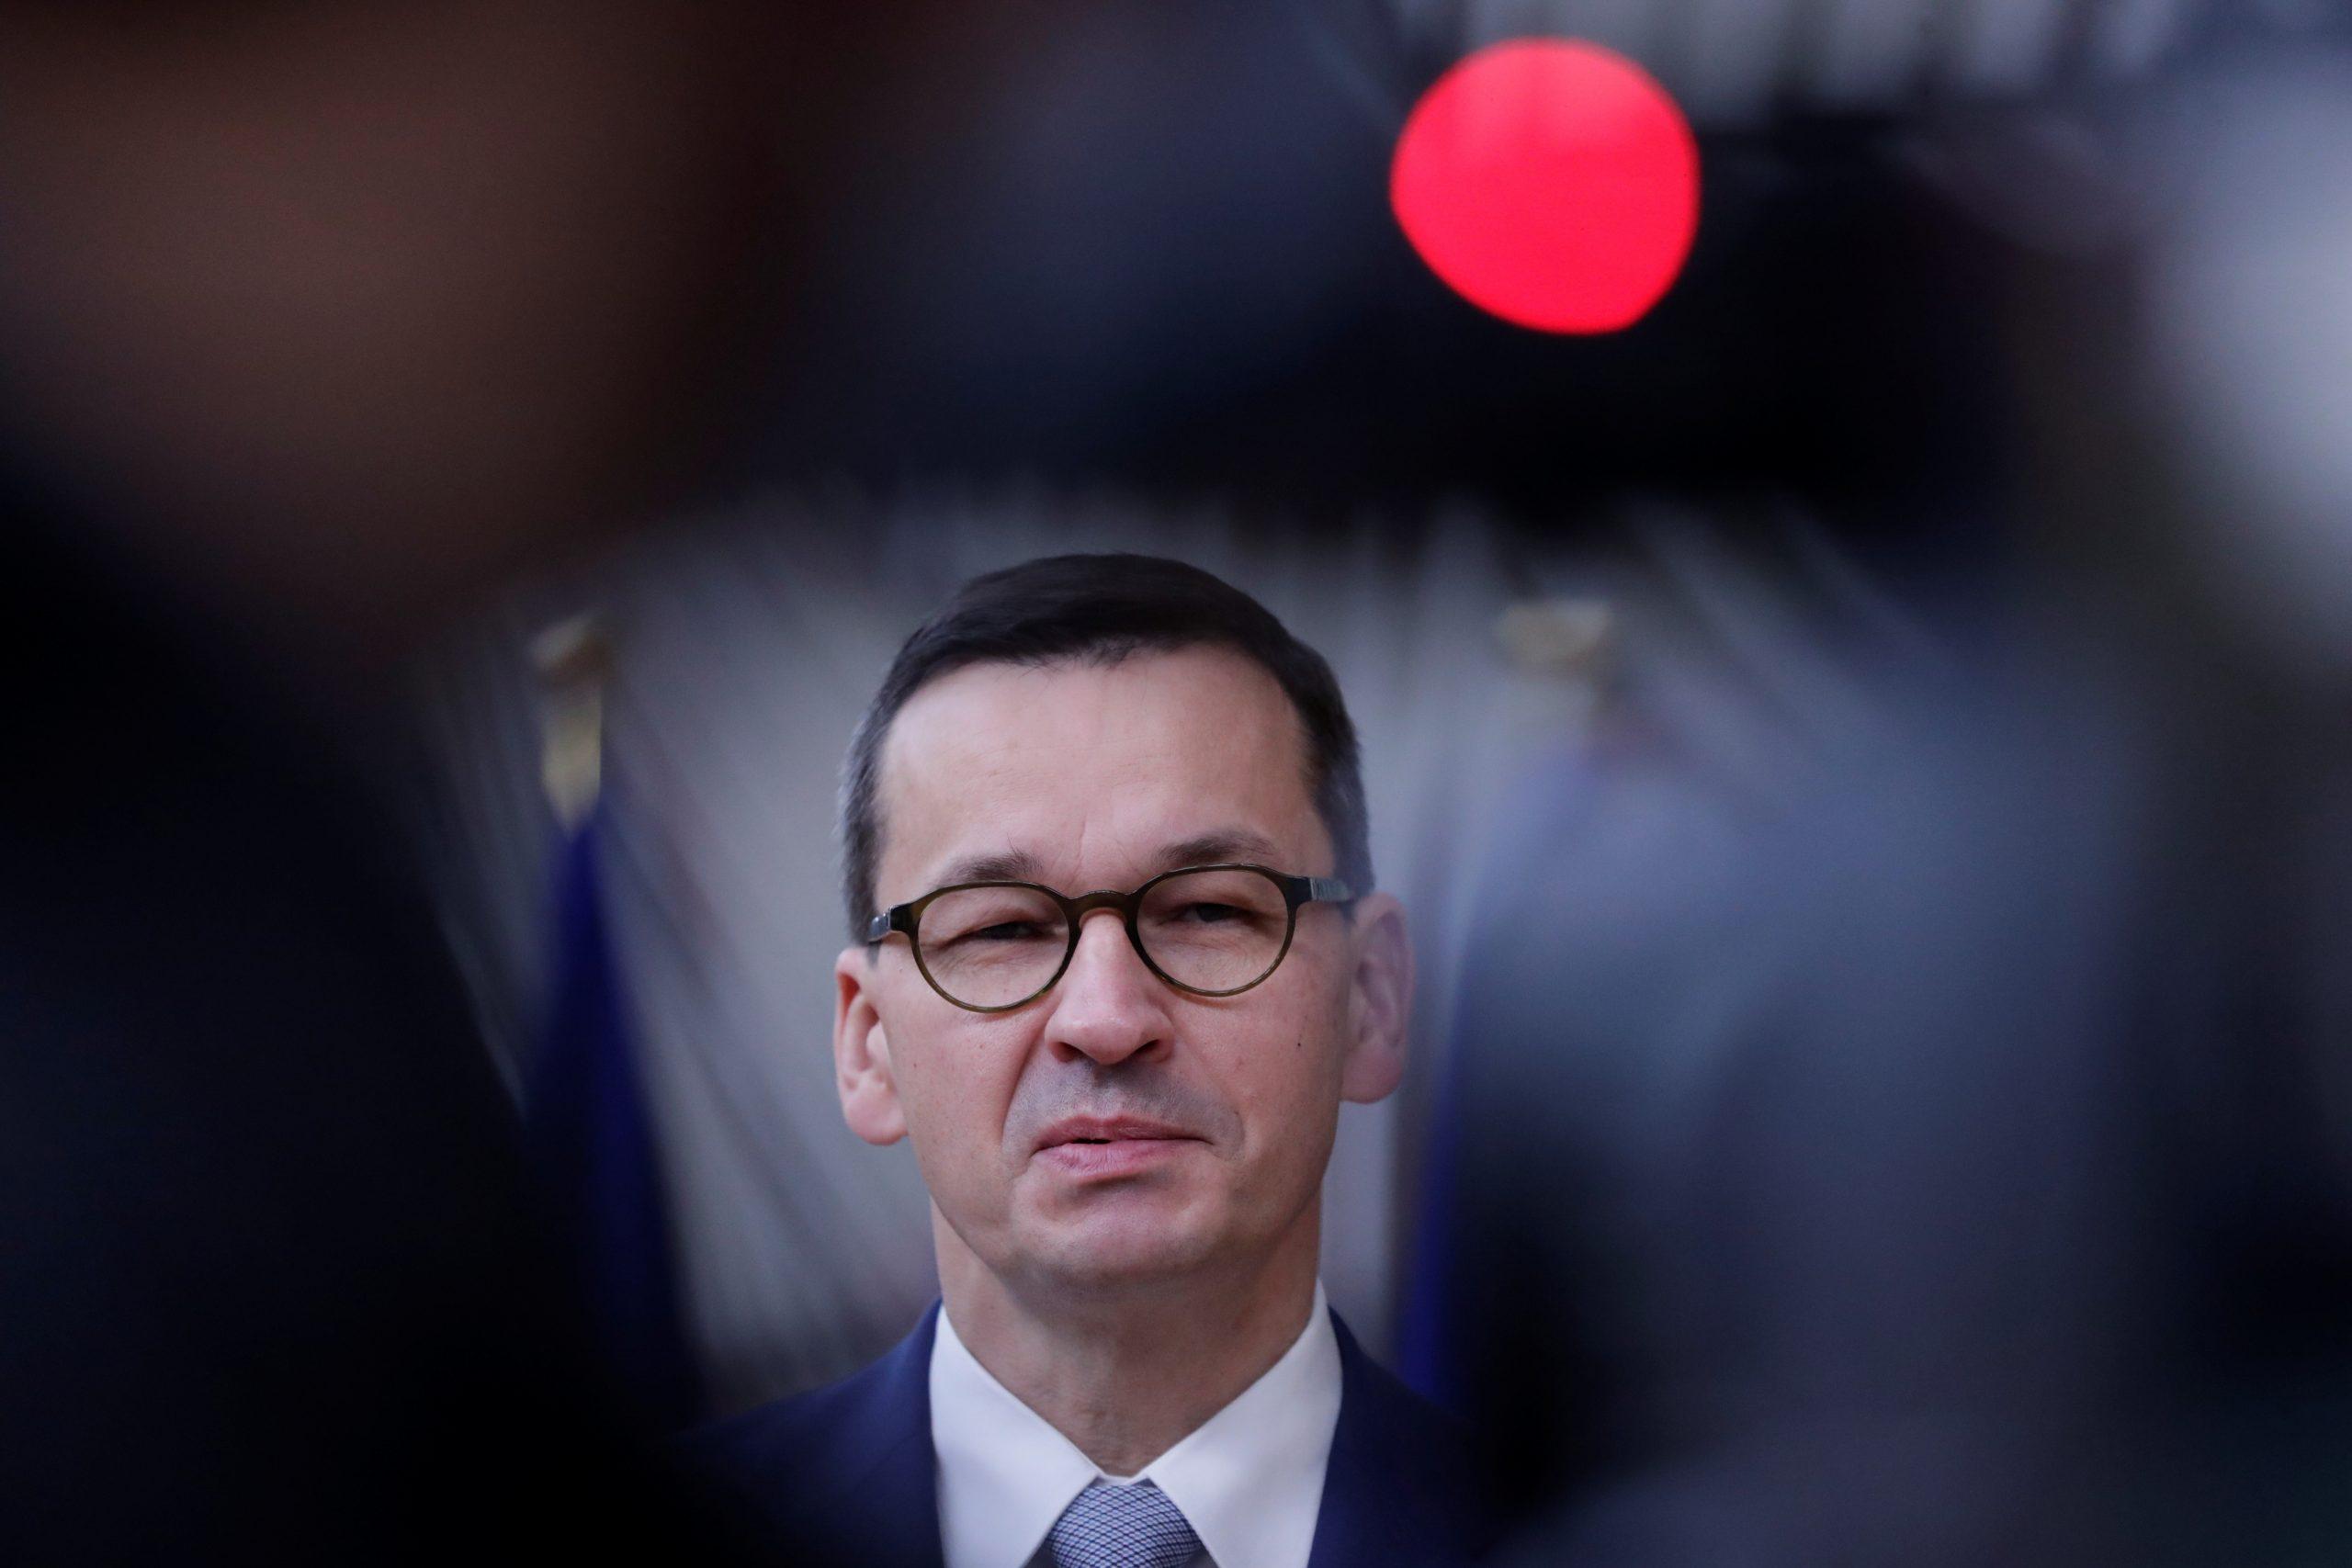 Polish Prime Minister Morawiecki on the COVID comeback, the Three Seas Initiative, and where the US is falling short